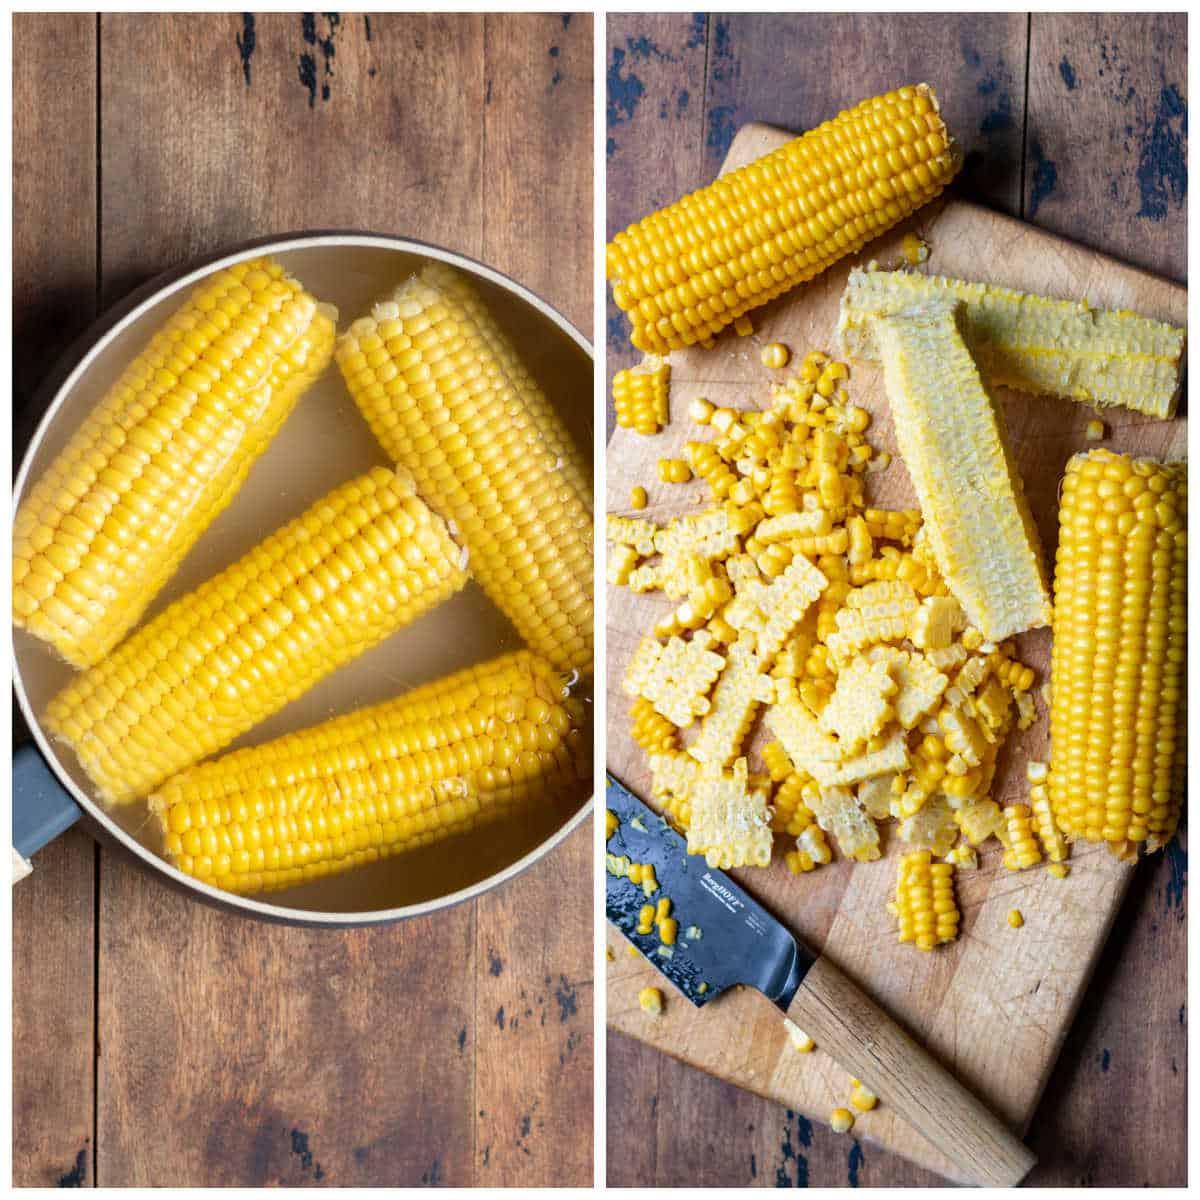 Collage: Boiling corn, removing kernels.